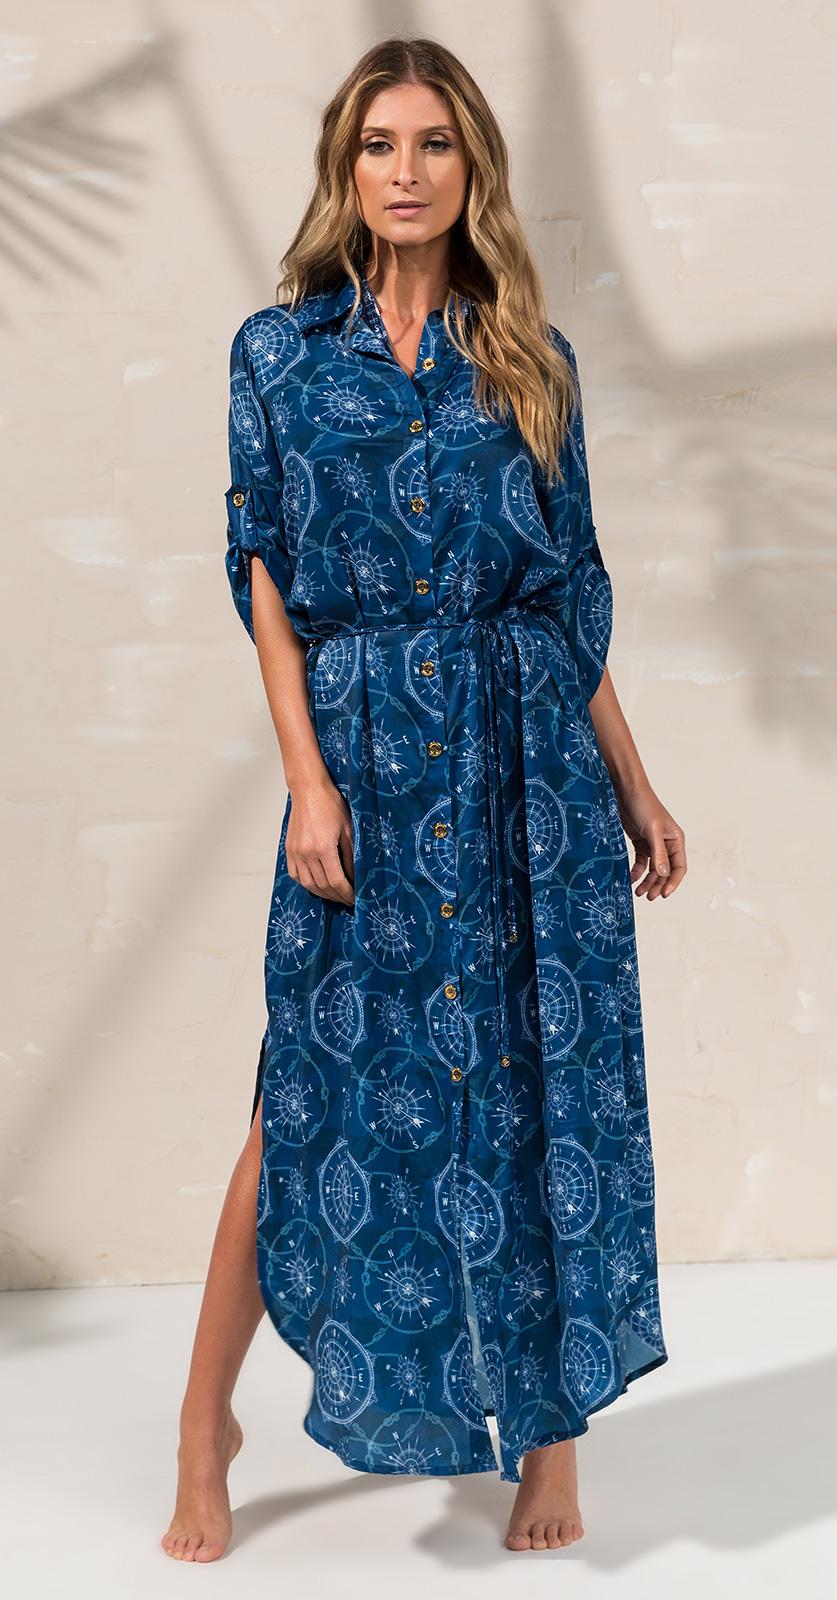 3565dd82b6ea Μακρύ φόρεμα με κουμπιά και εμπριμέ μοτίβα σε ναυτικό μπλε χρώμα ...